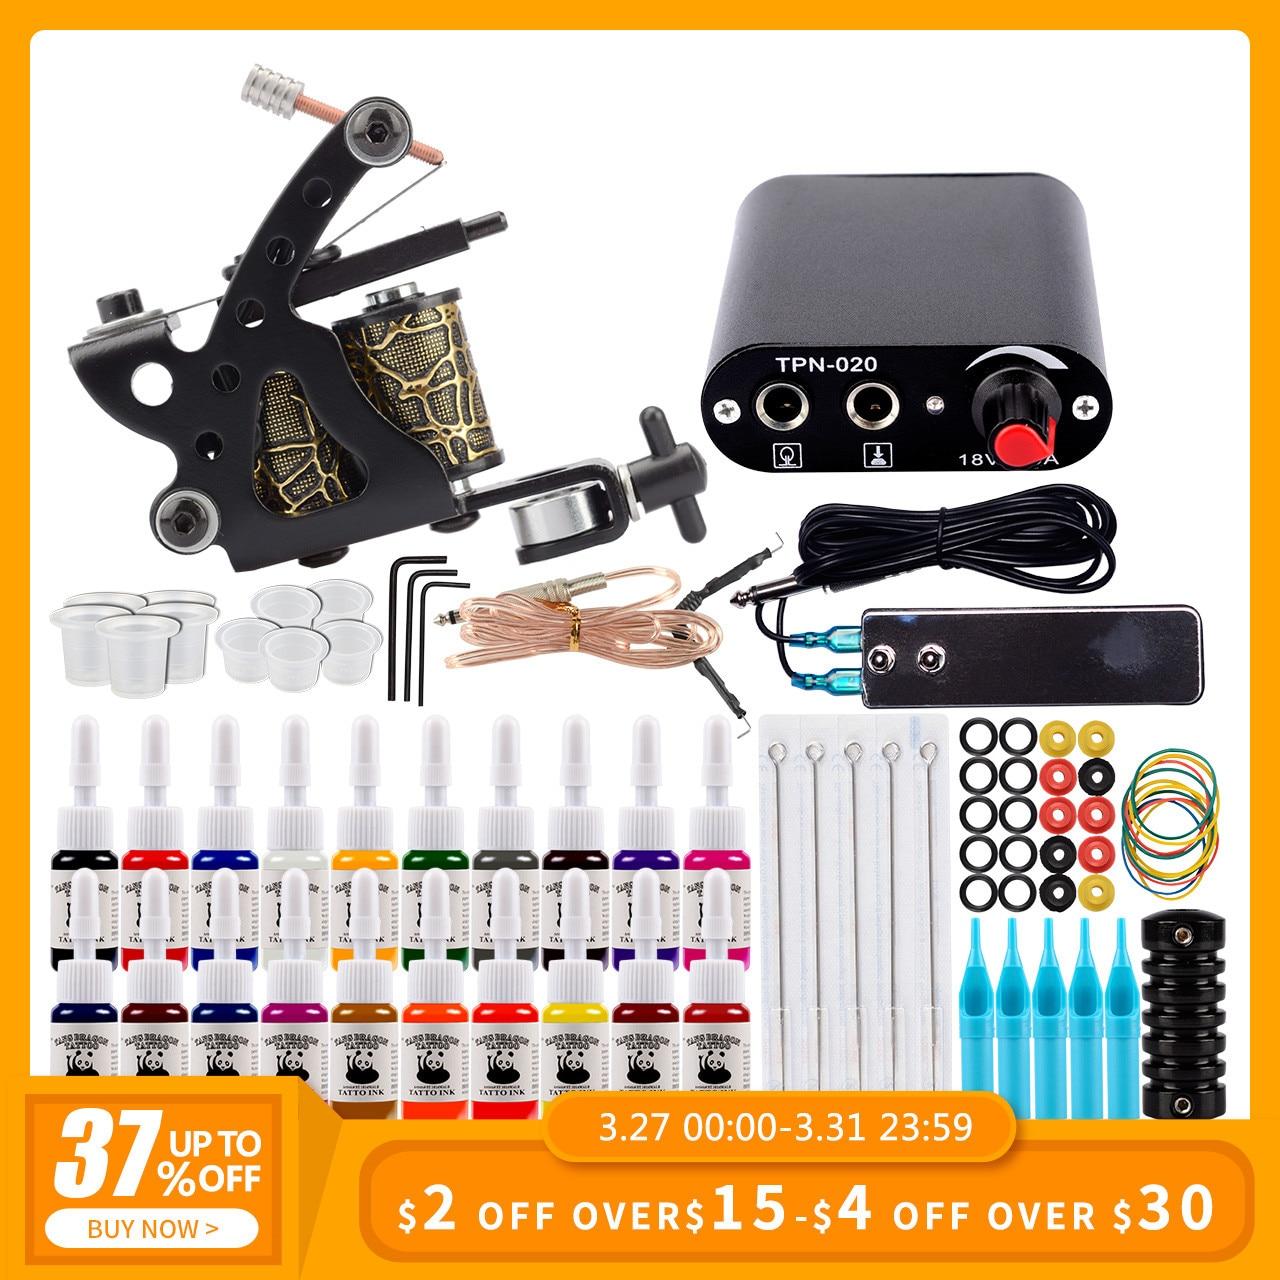 Starter Tattoo Kit One Coils Gun 20 Colors Pigment Inks Set Mini Power Supply Permanent Makeup Body Art Tattoo Machine Set